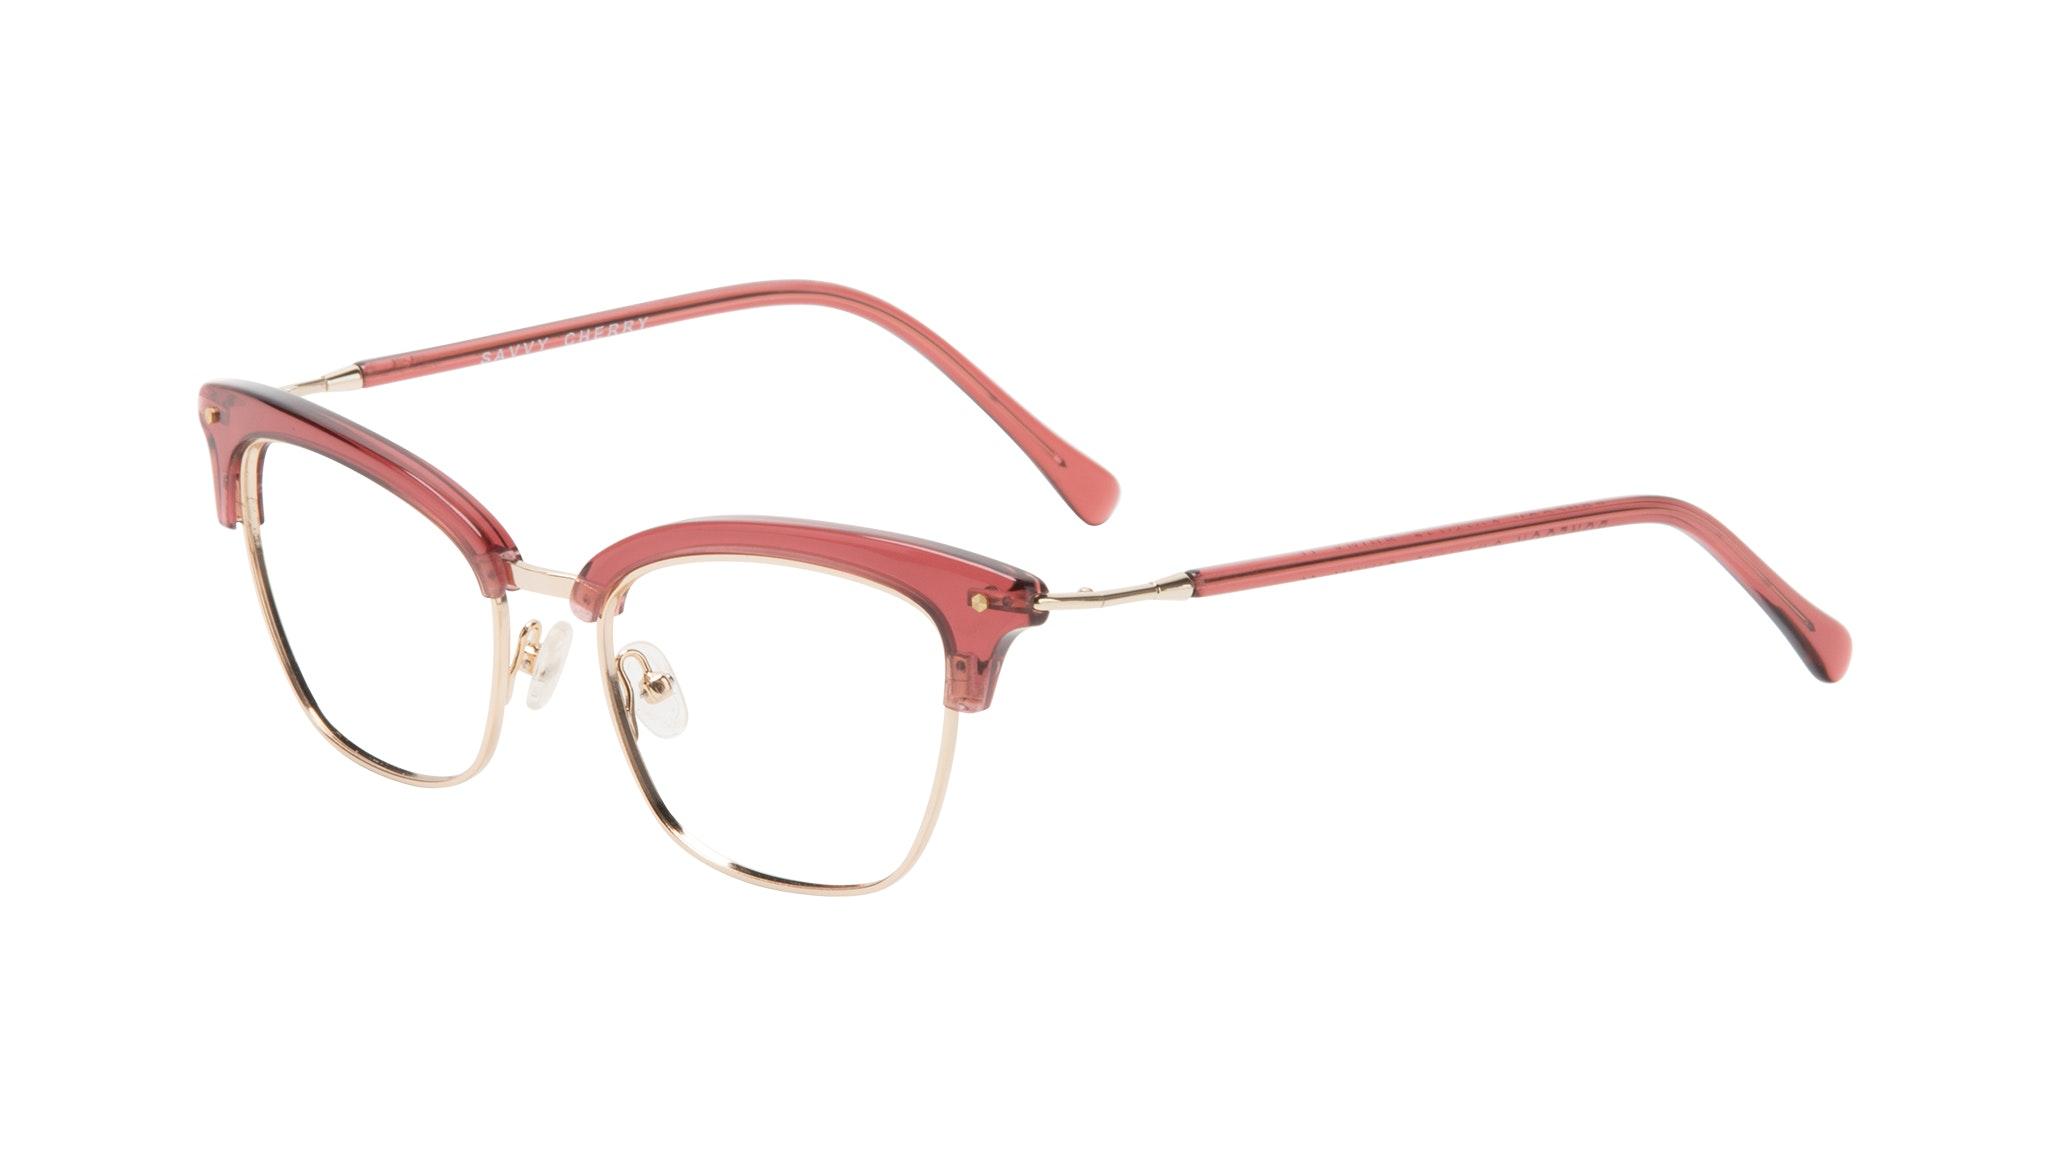 Affordable Fashion Glasses Cat Eye Eyeglasses Women Savvy Cherry Tilt